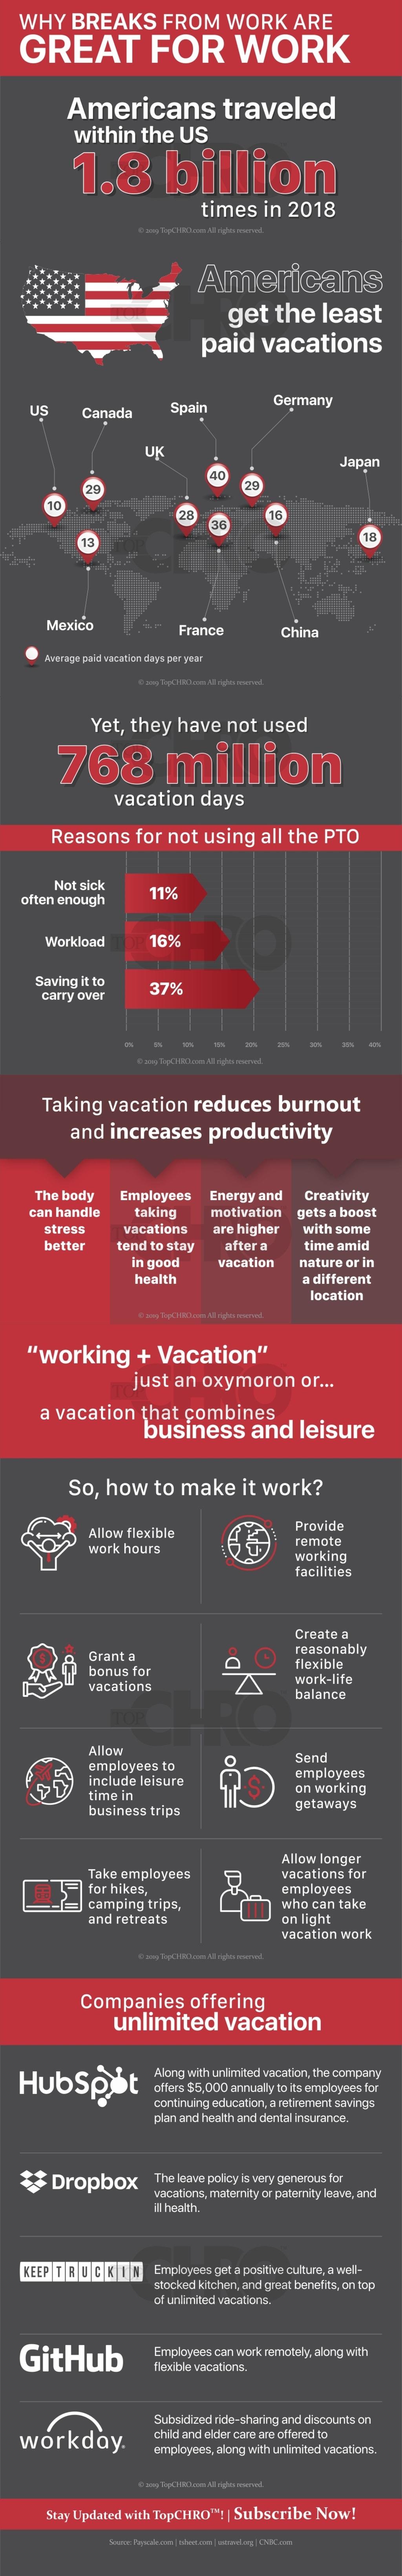 Create a work-life balance with paid time off via TopCHRO